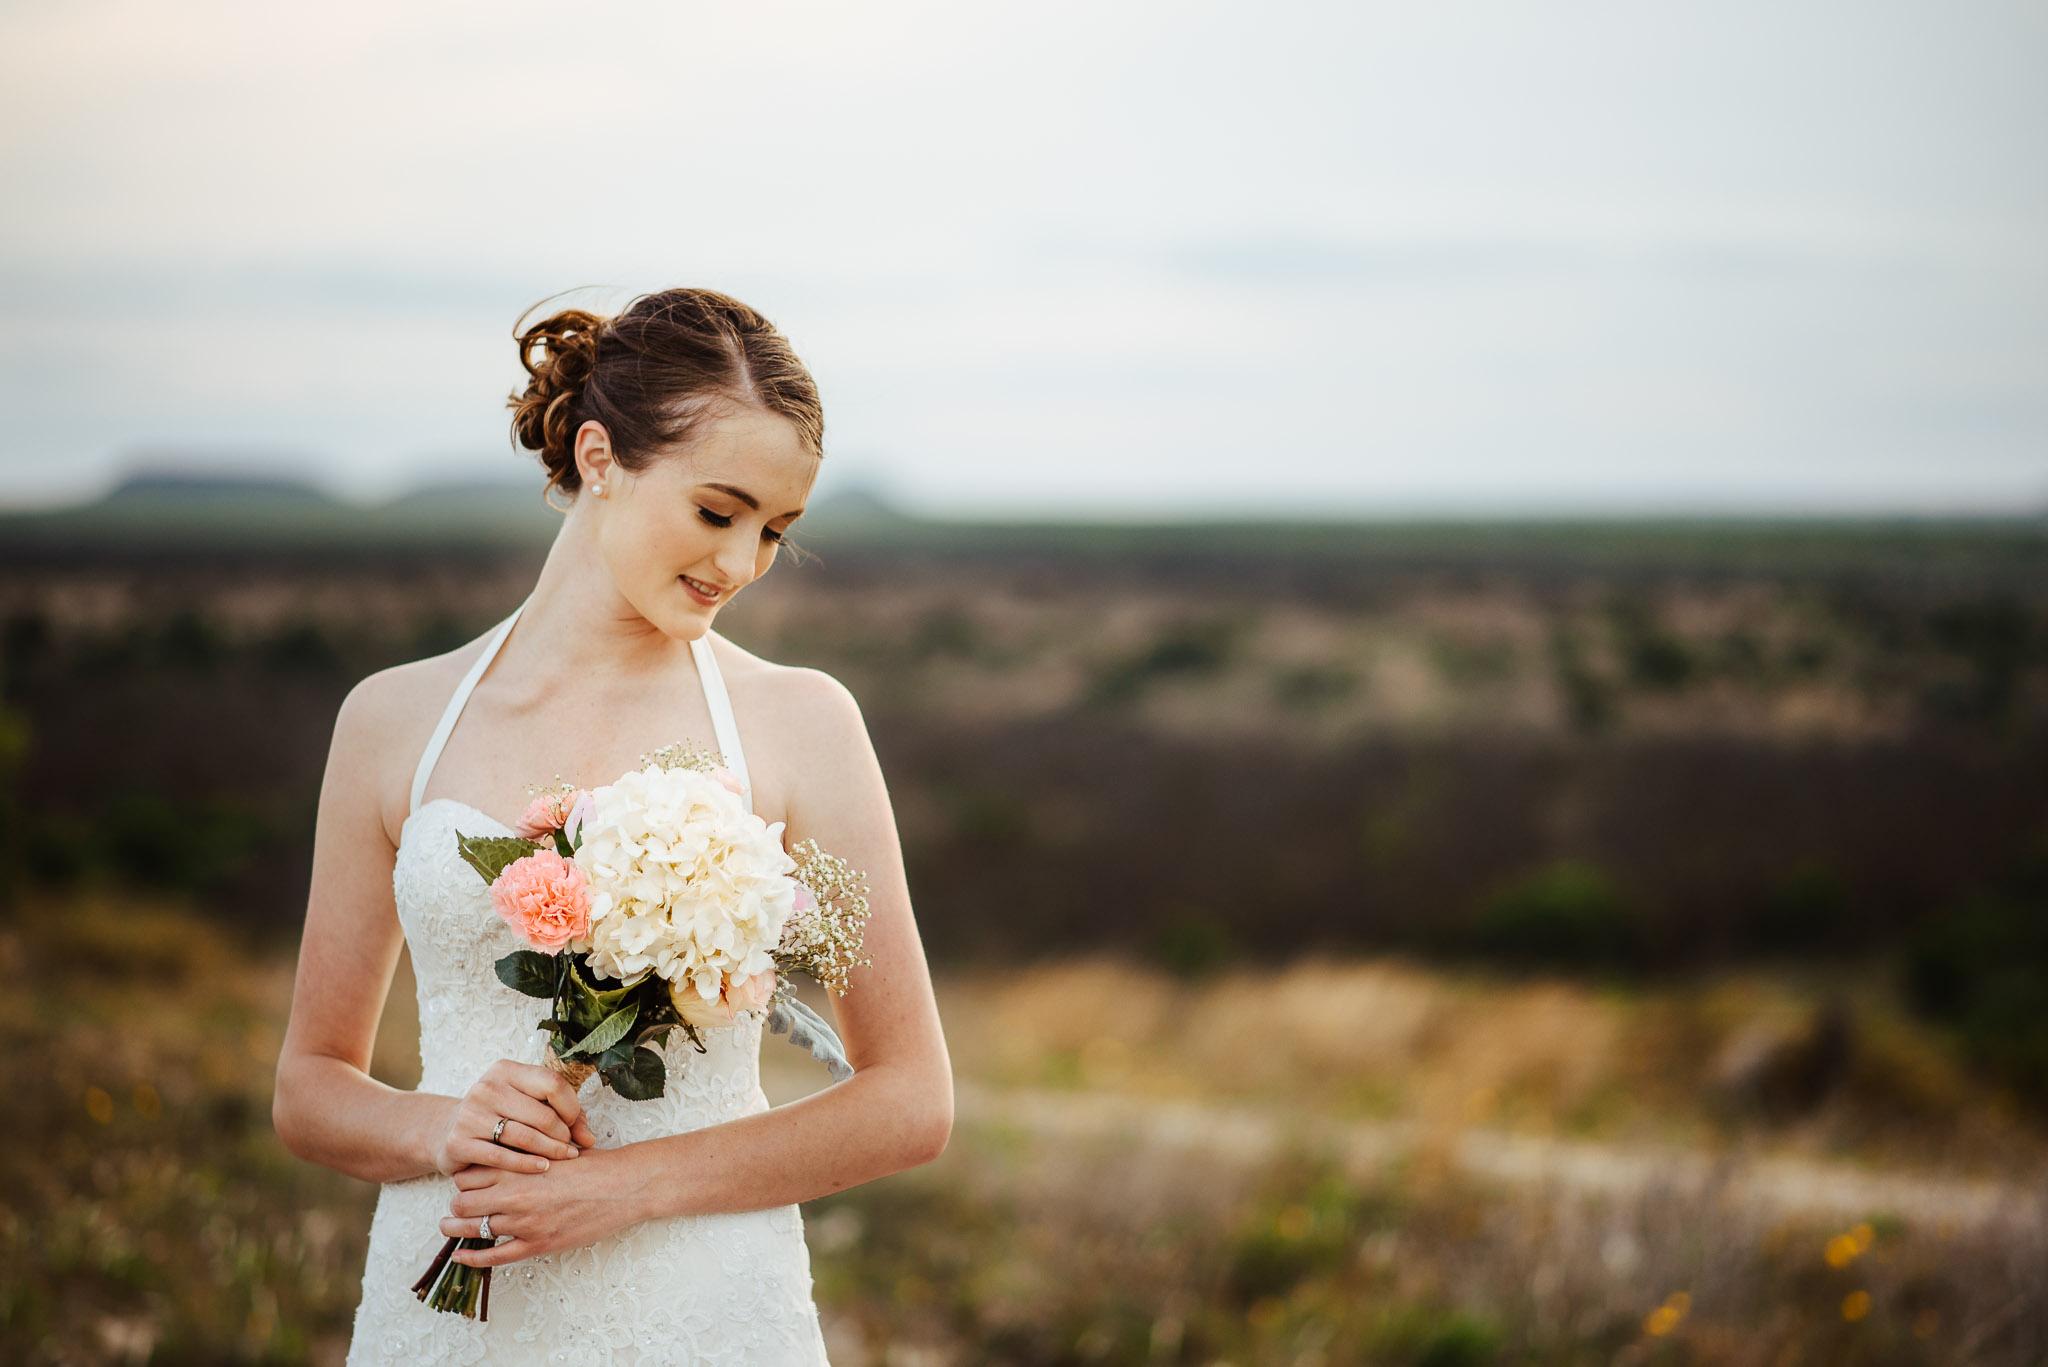 West-Texas-Wedding-Photographer-0006.jpg